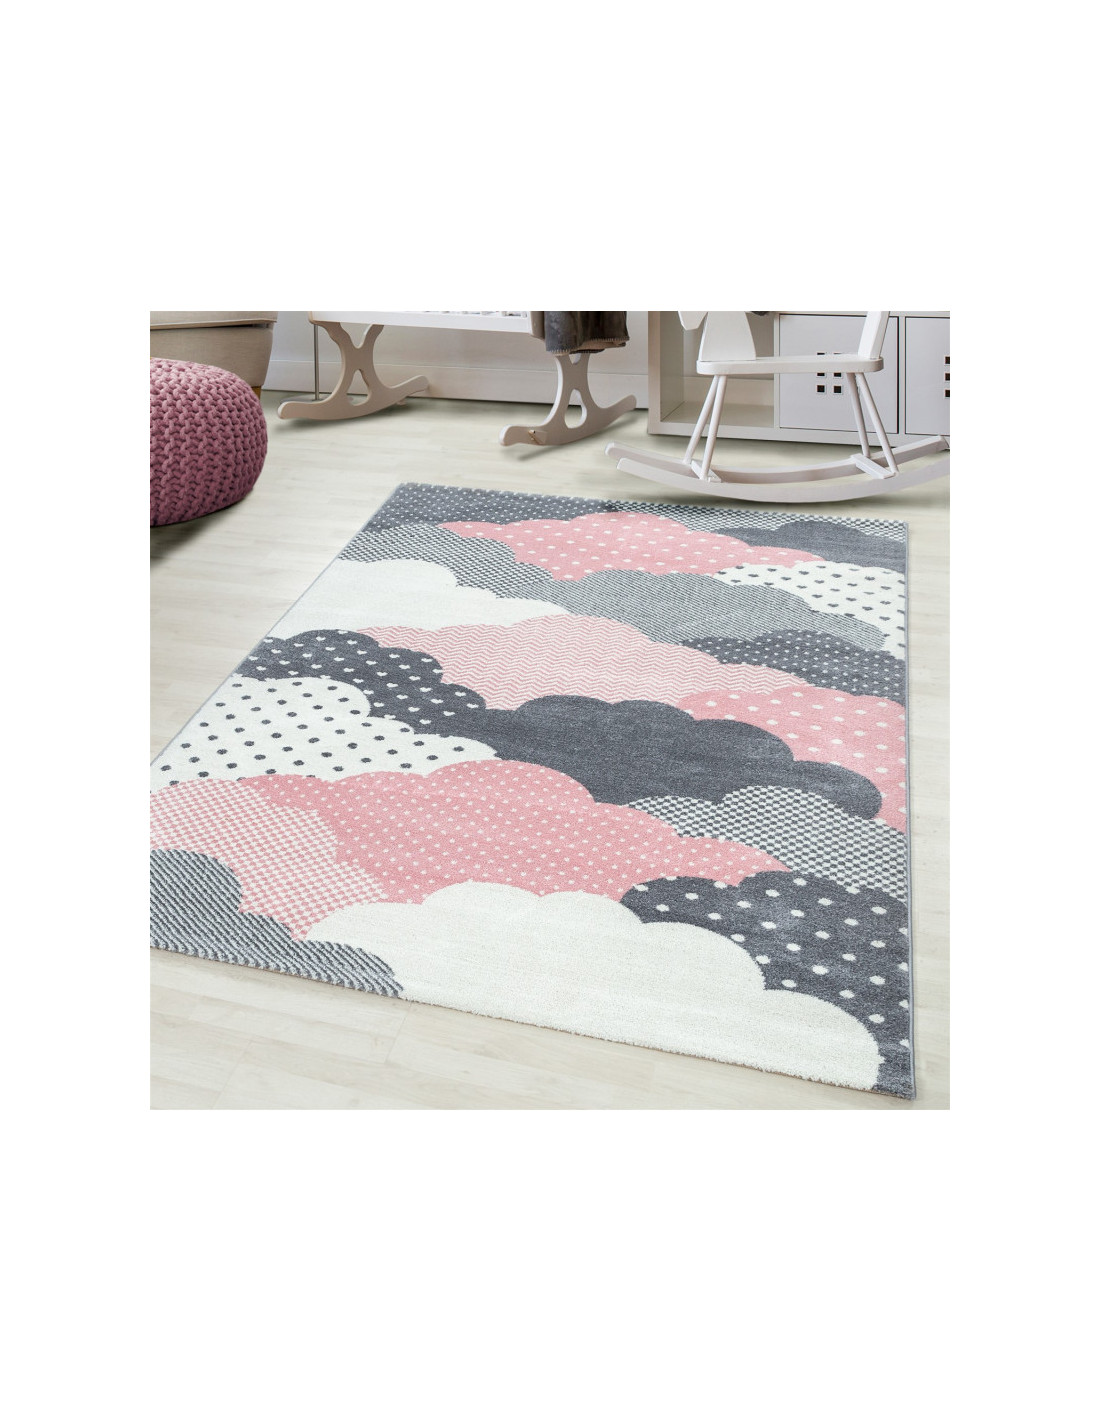 Children's carpet Children's room carpet 3D clouds motif pink gray white